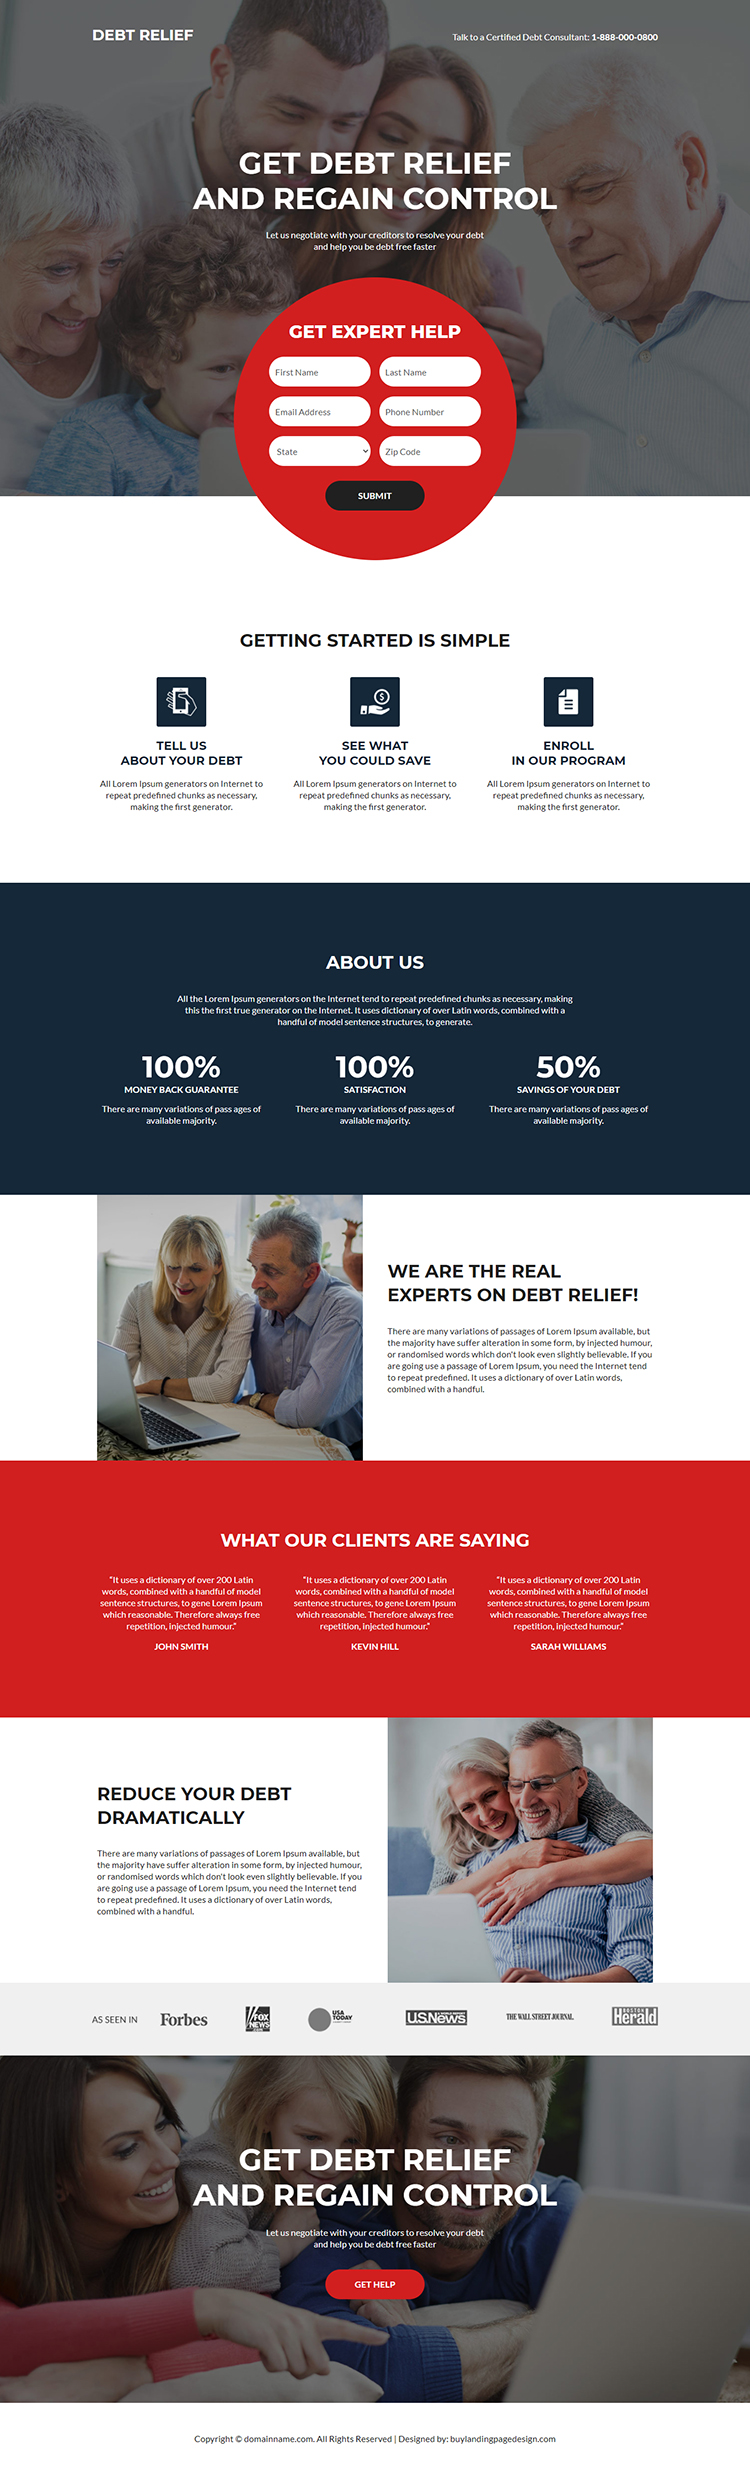 debt relief assistance responsive landing page design